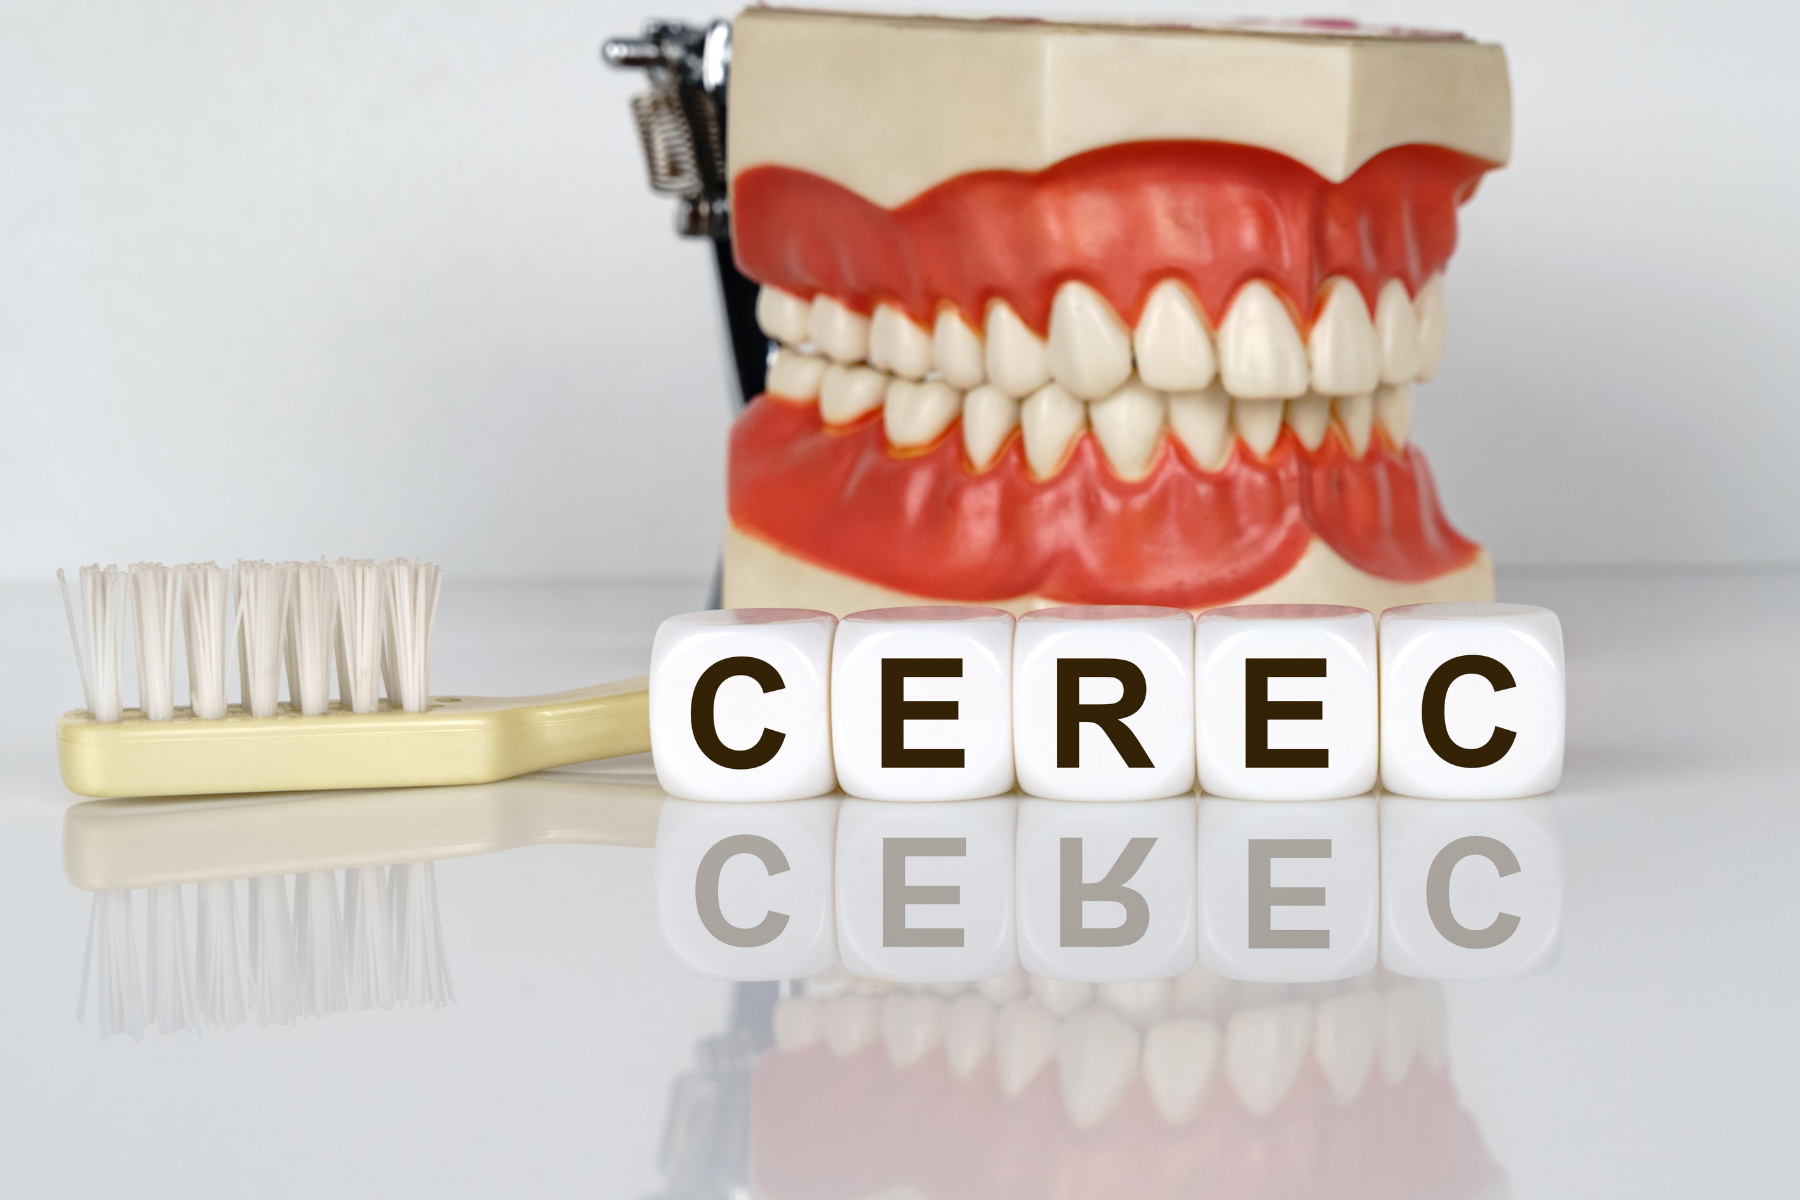 CEREC Crowns